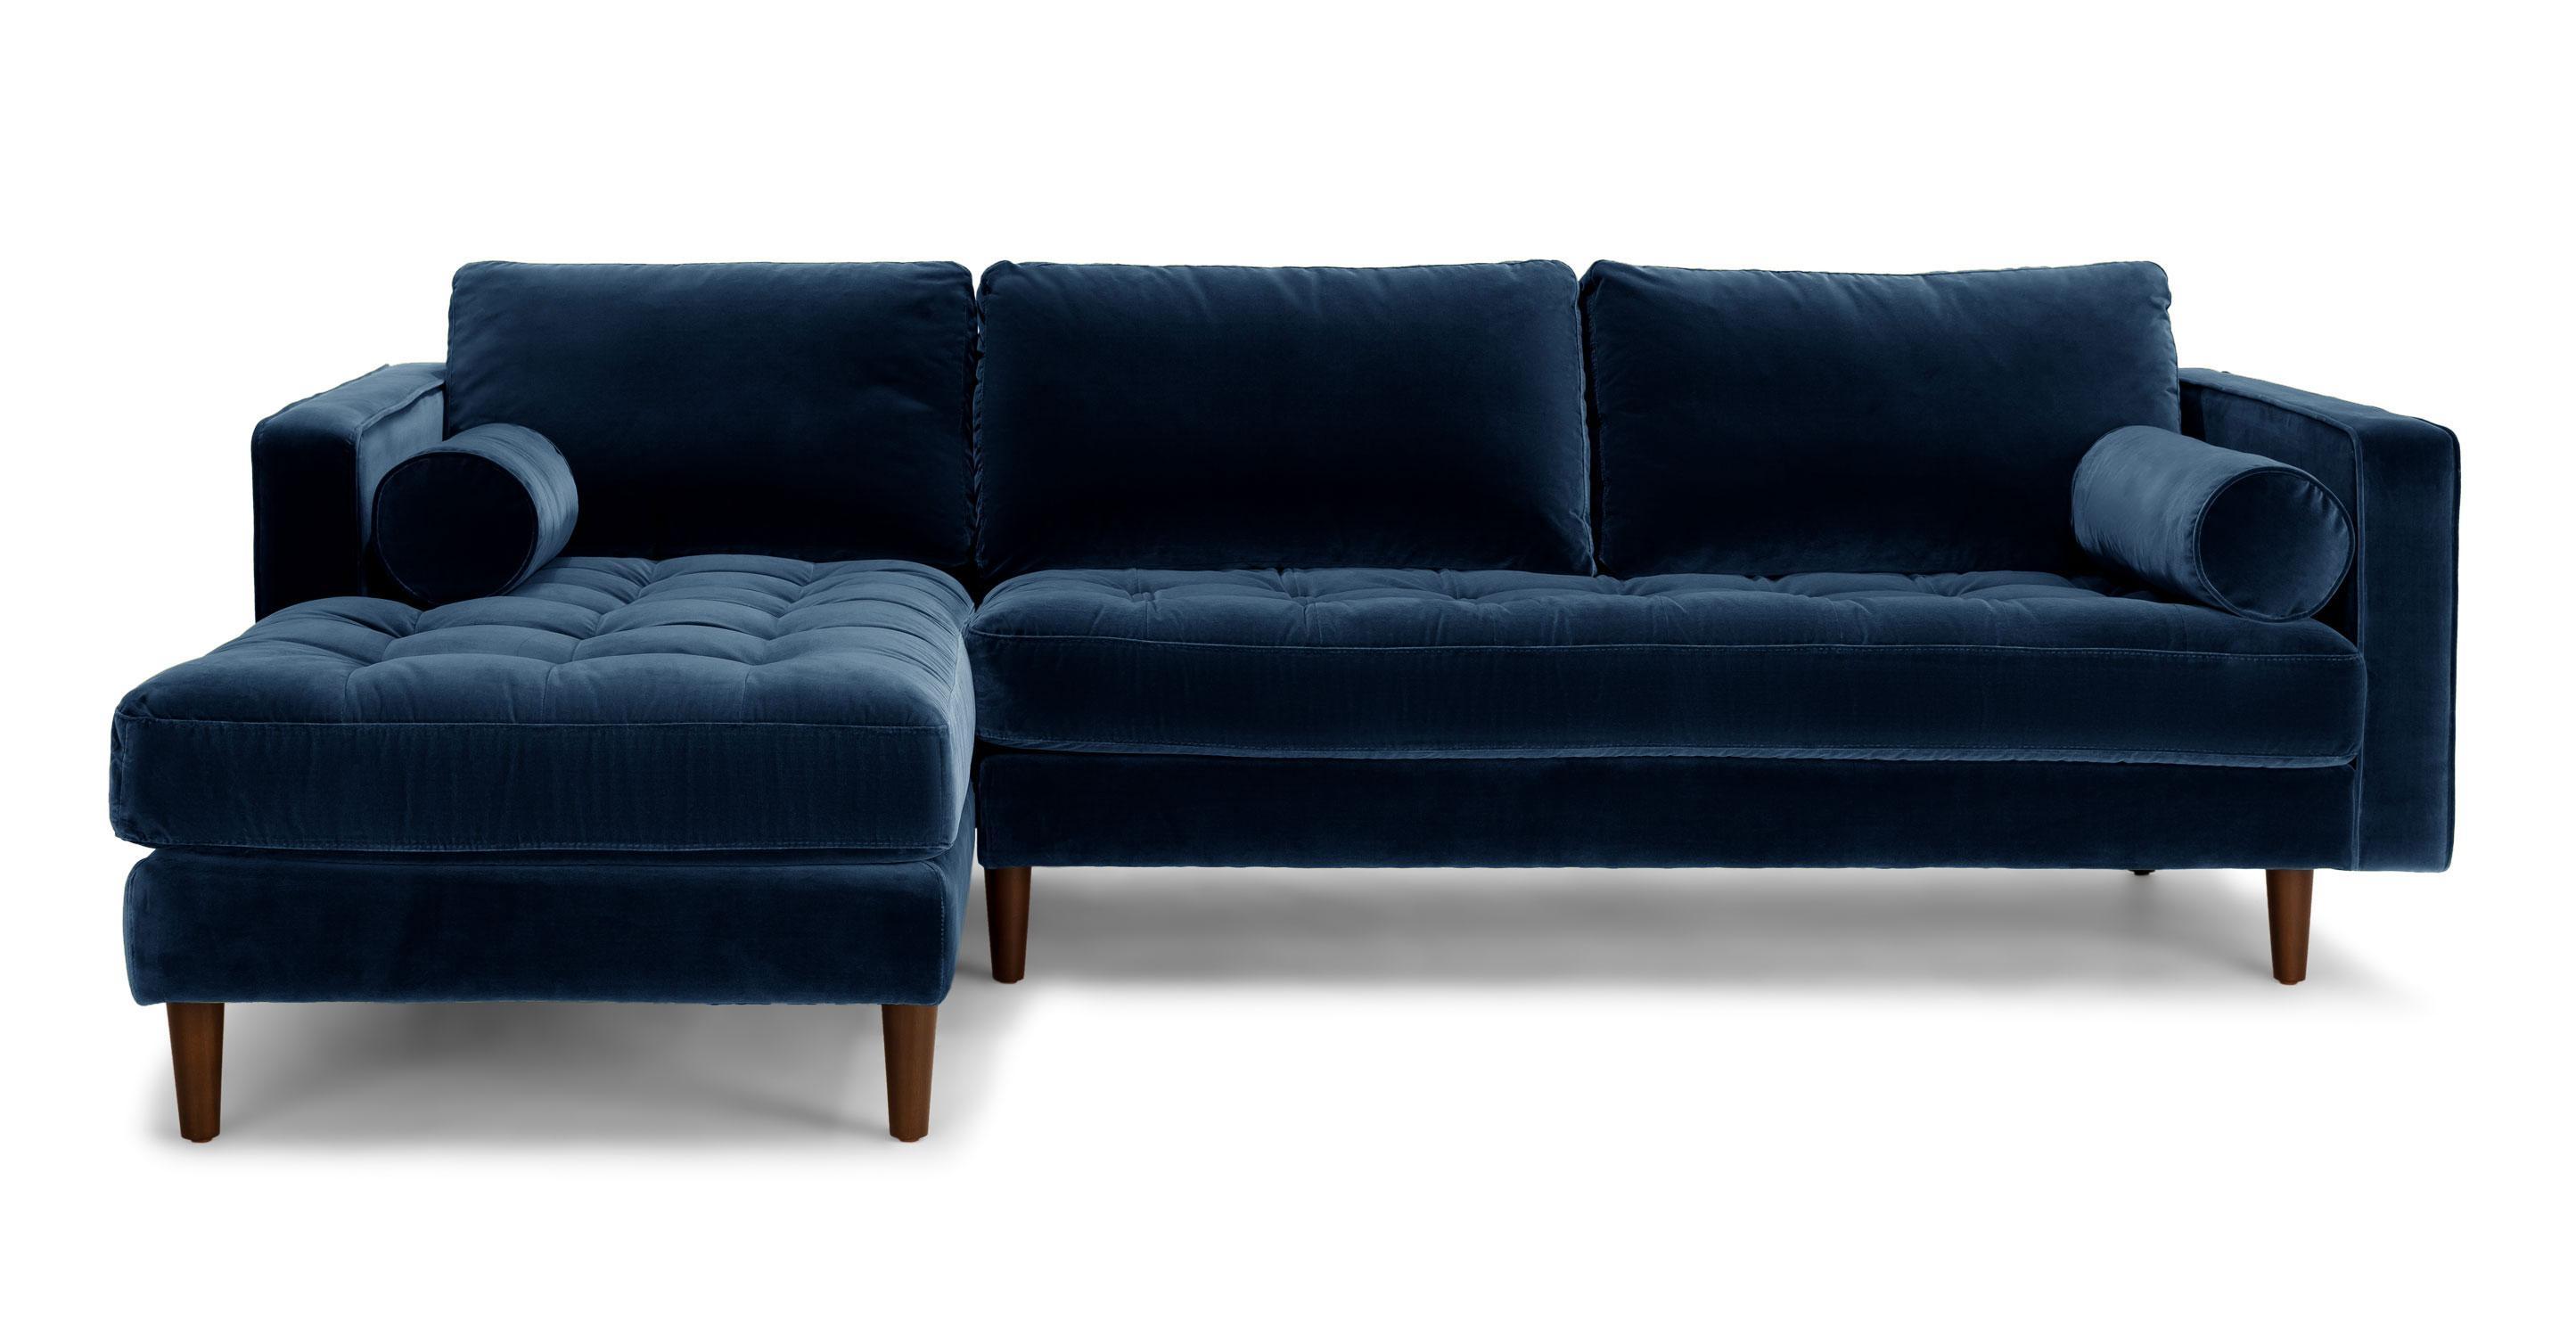 velvet sectional sofa 9 piece 2018 latest sofas sectionals ideas